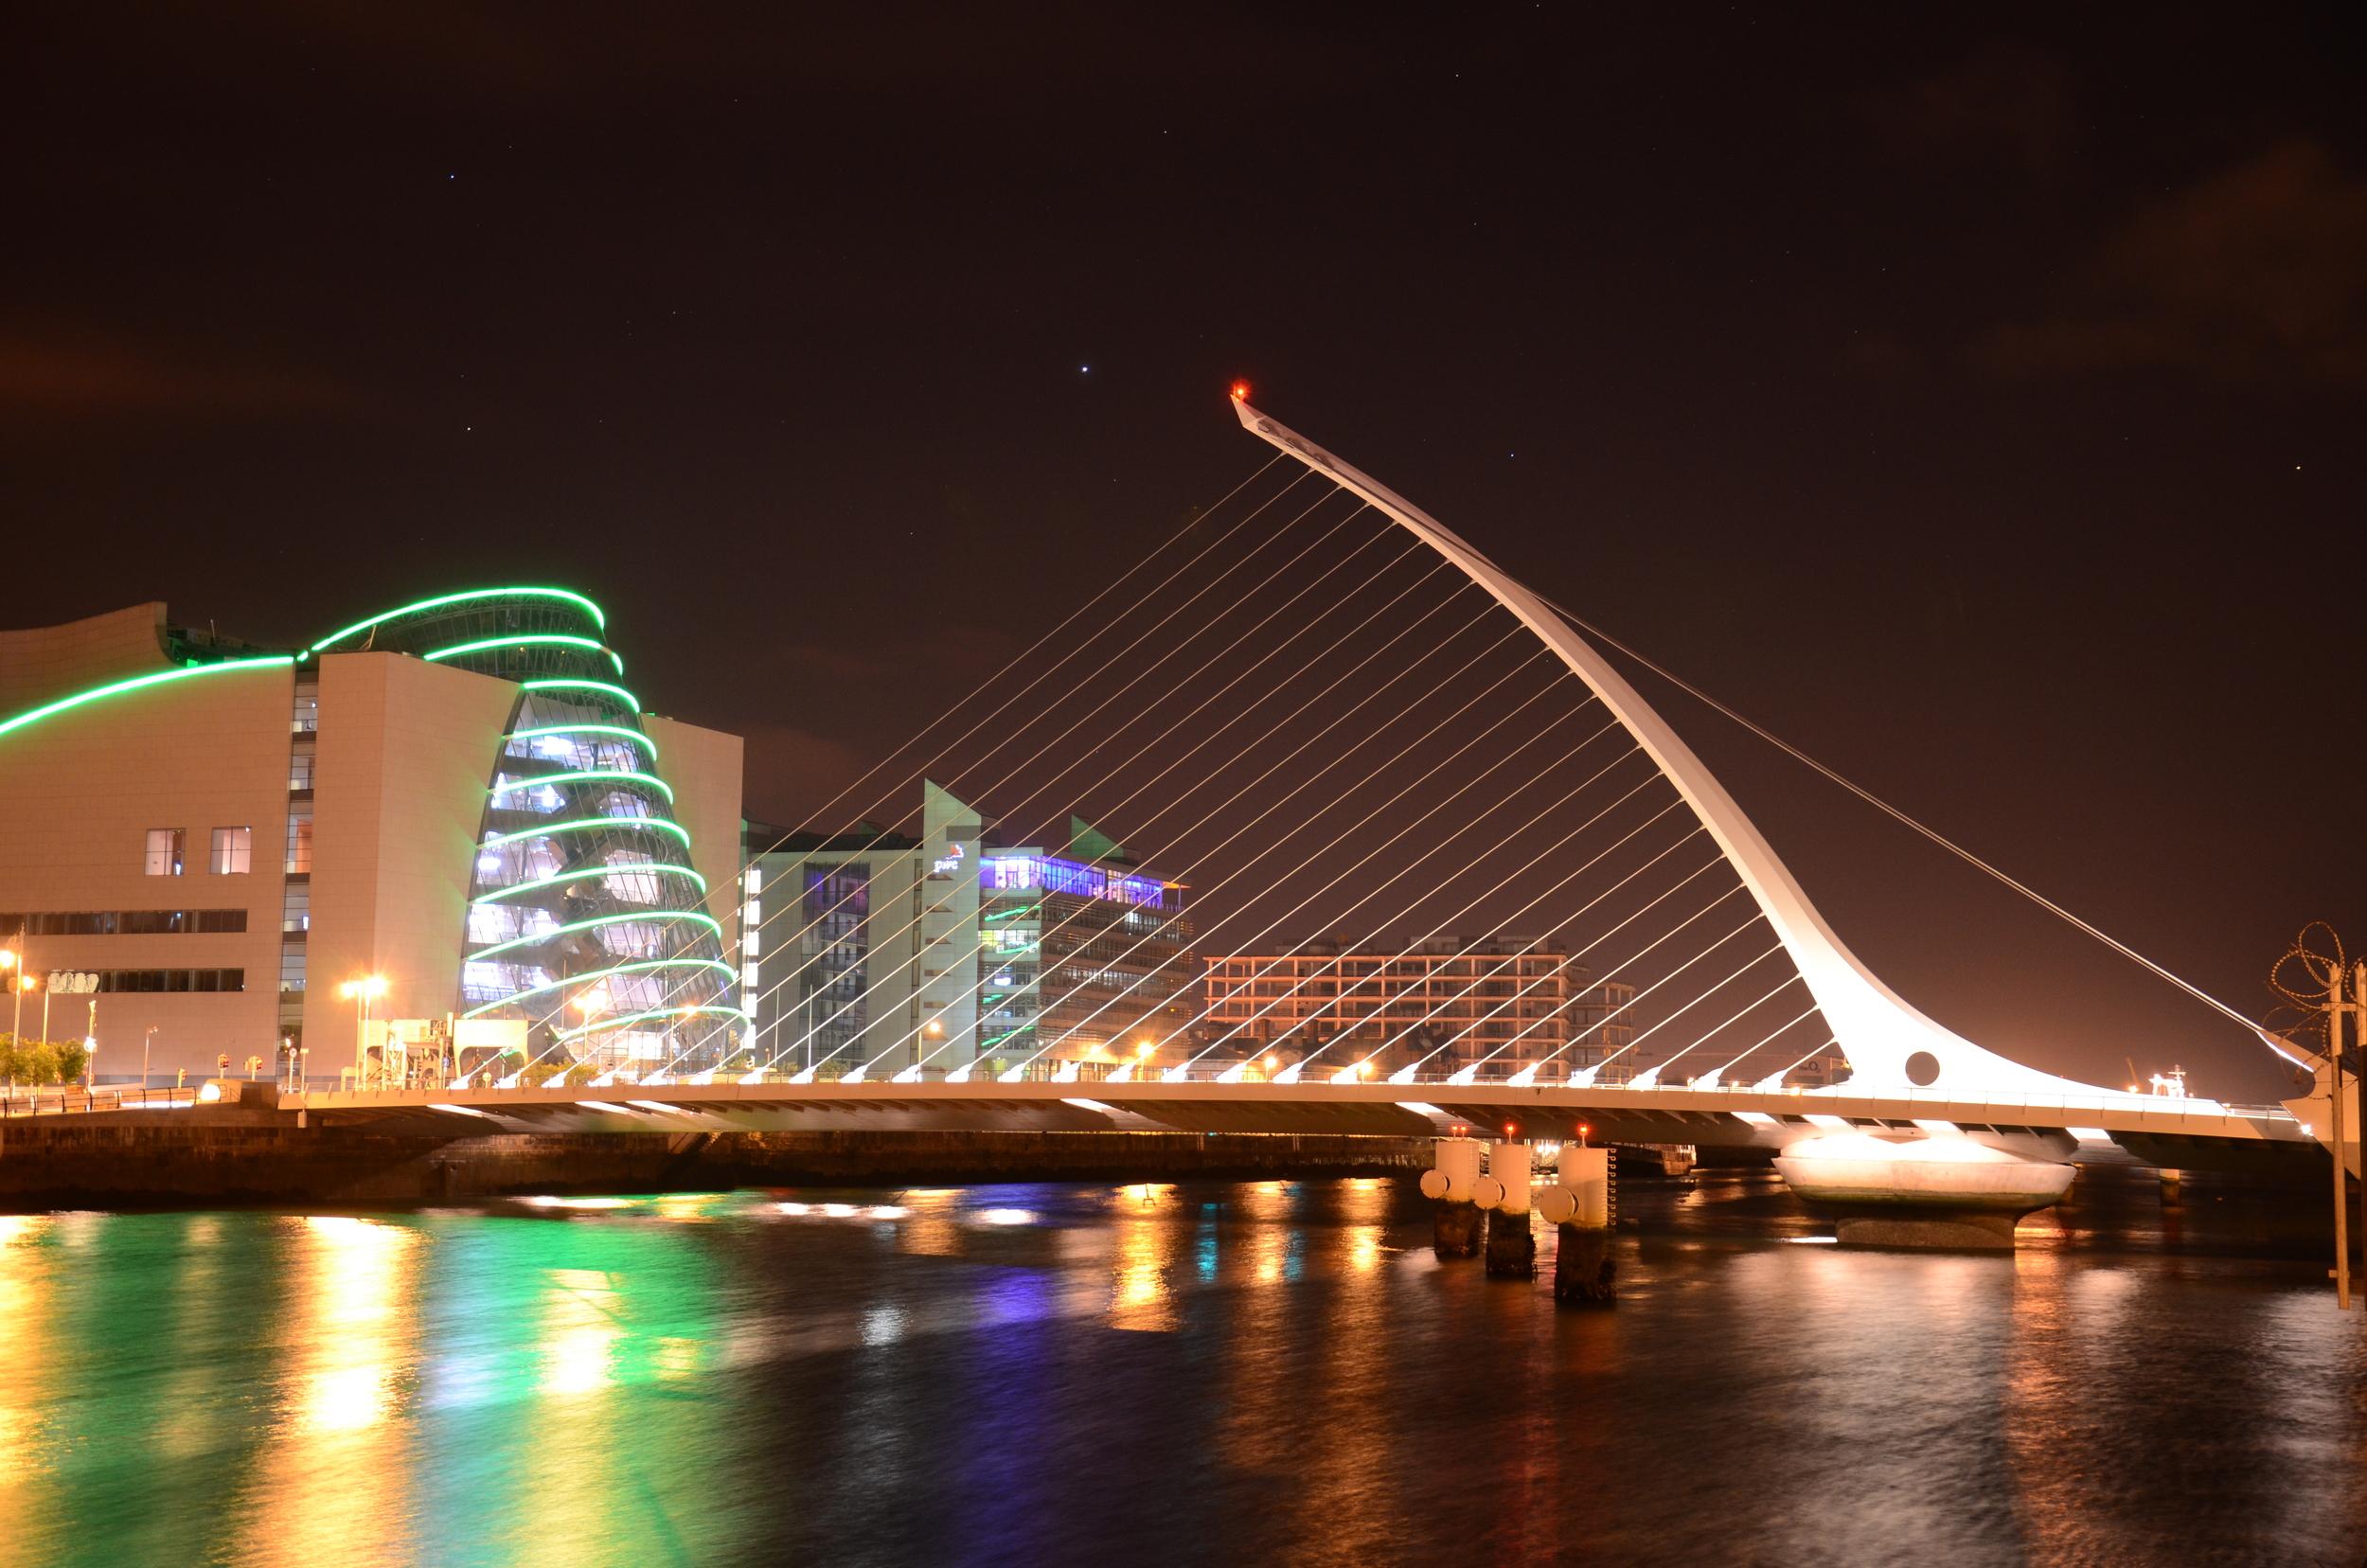 Calatrava's Samuel Beckett Bridge over the River Liffey